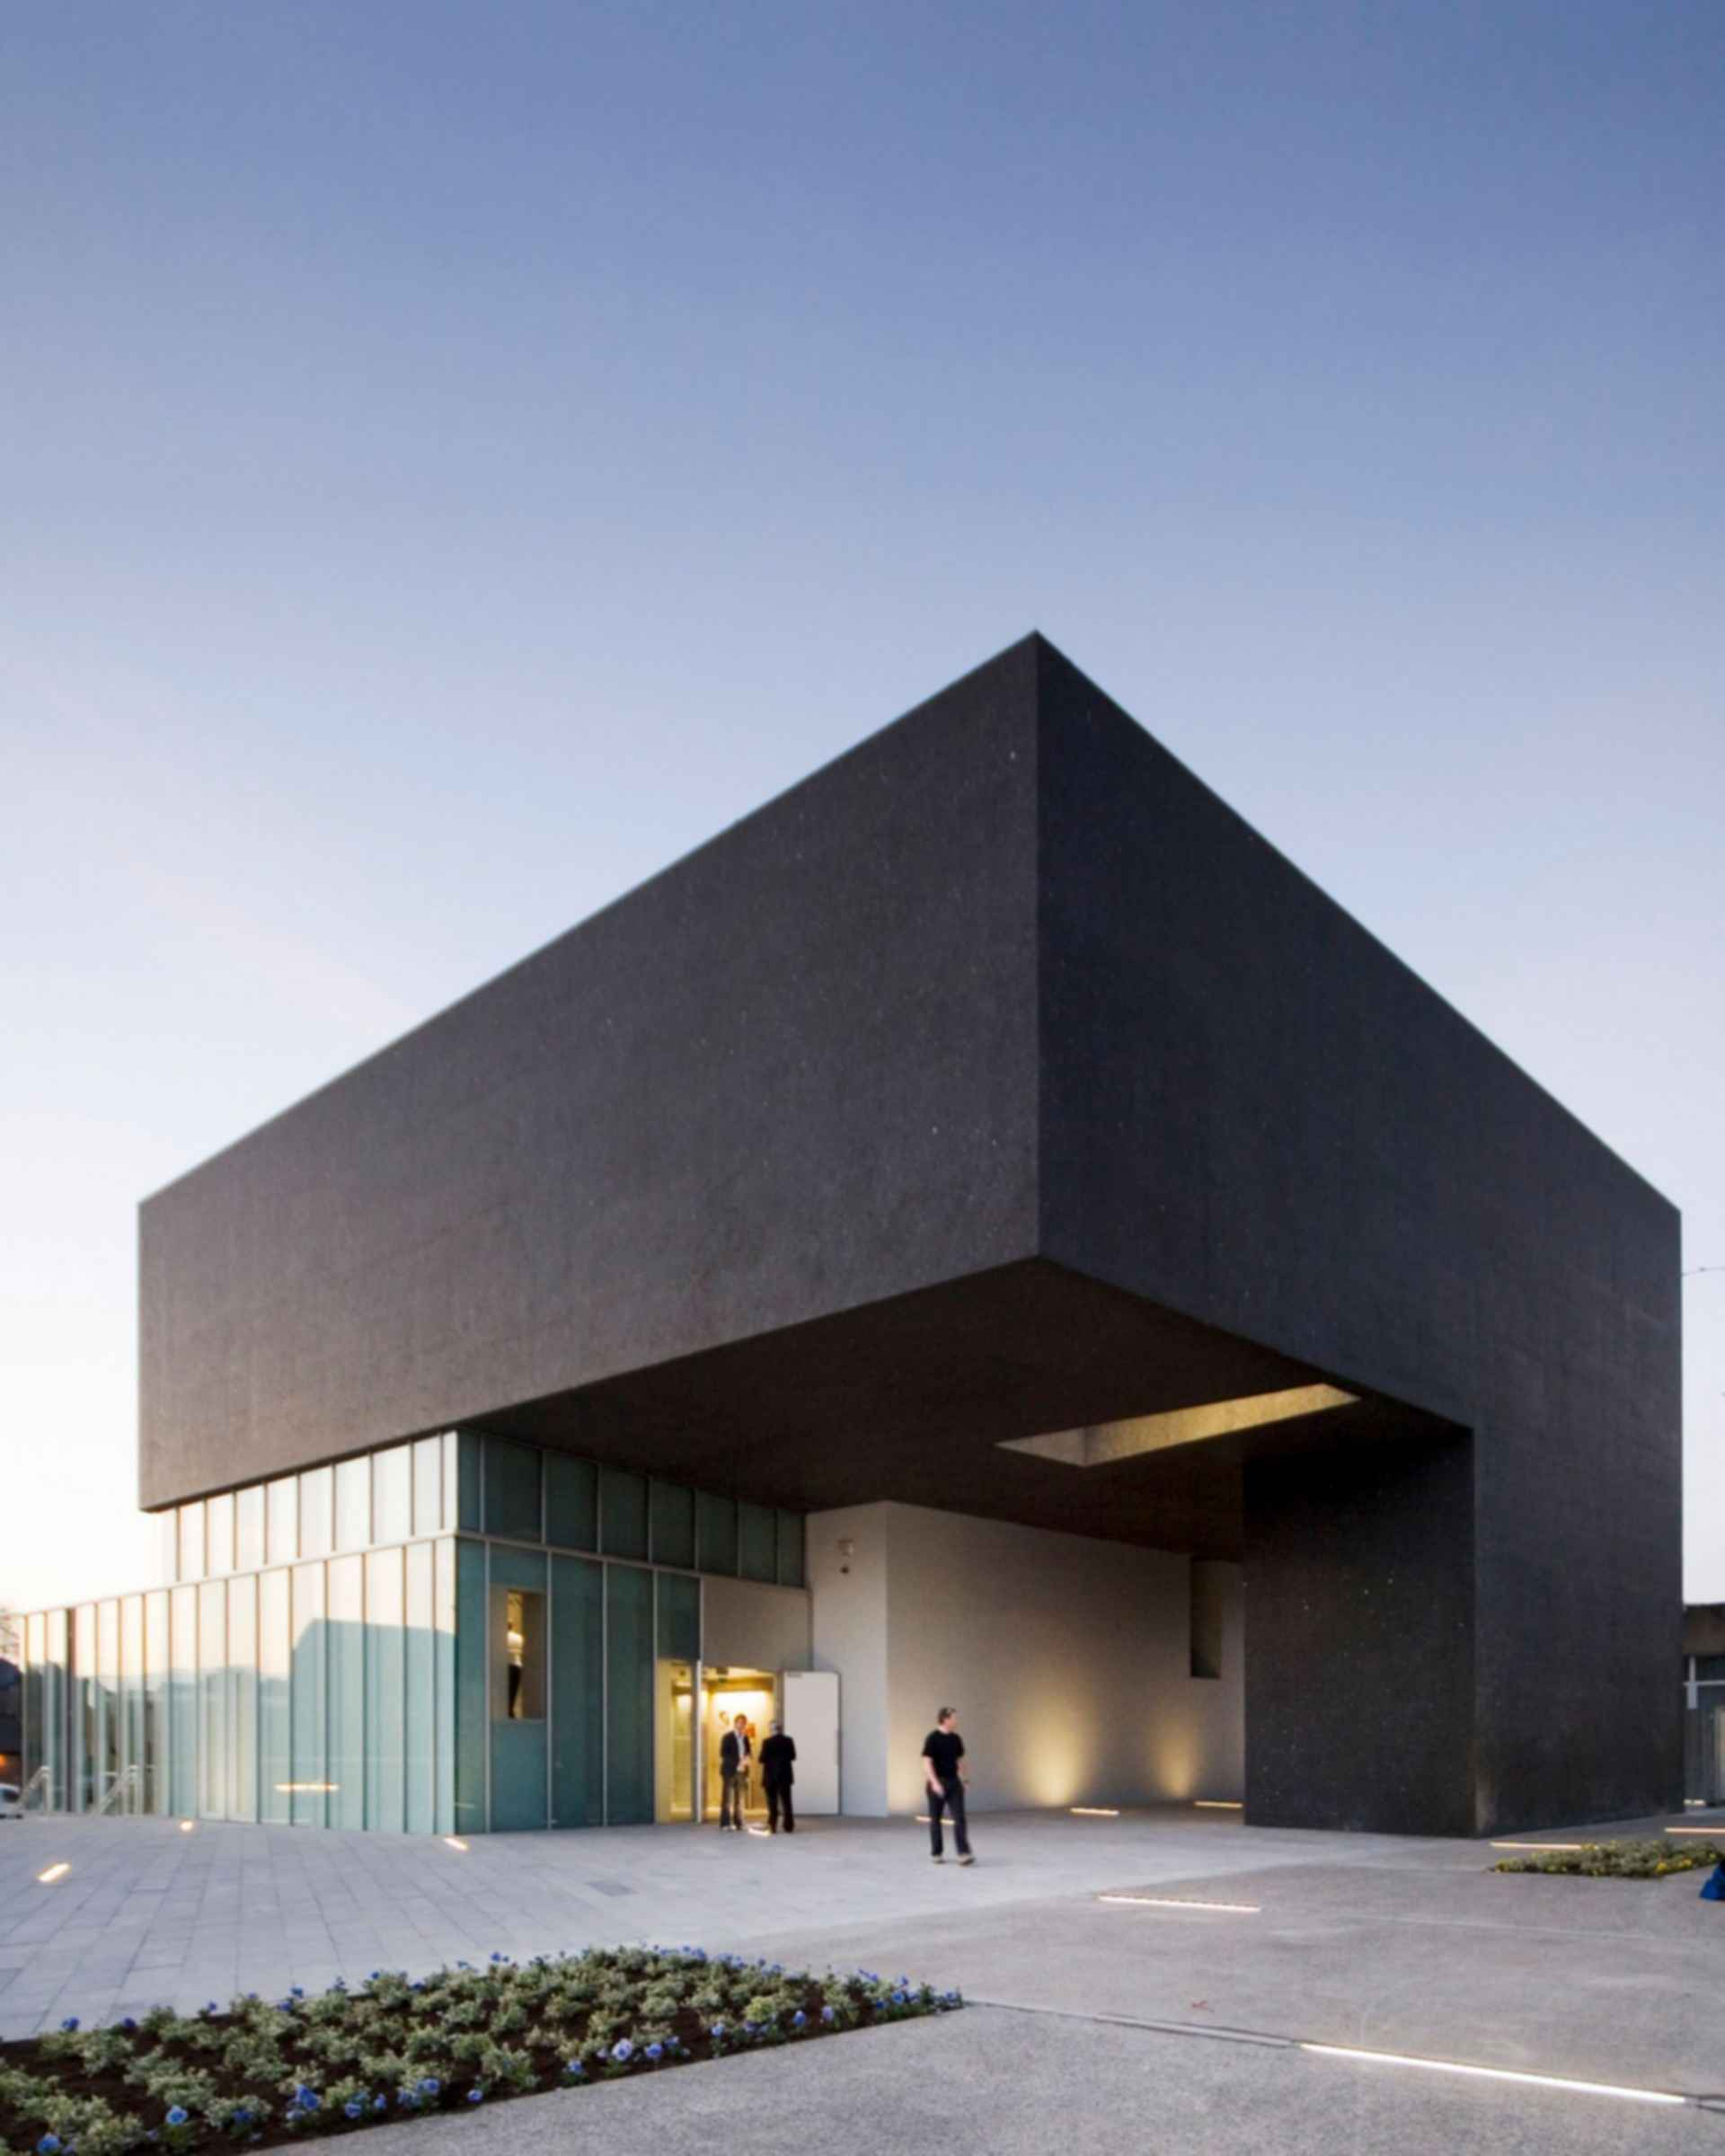 Solstice Arts Center - Exterior